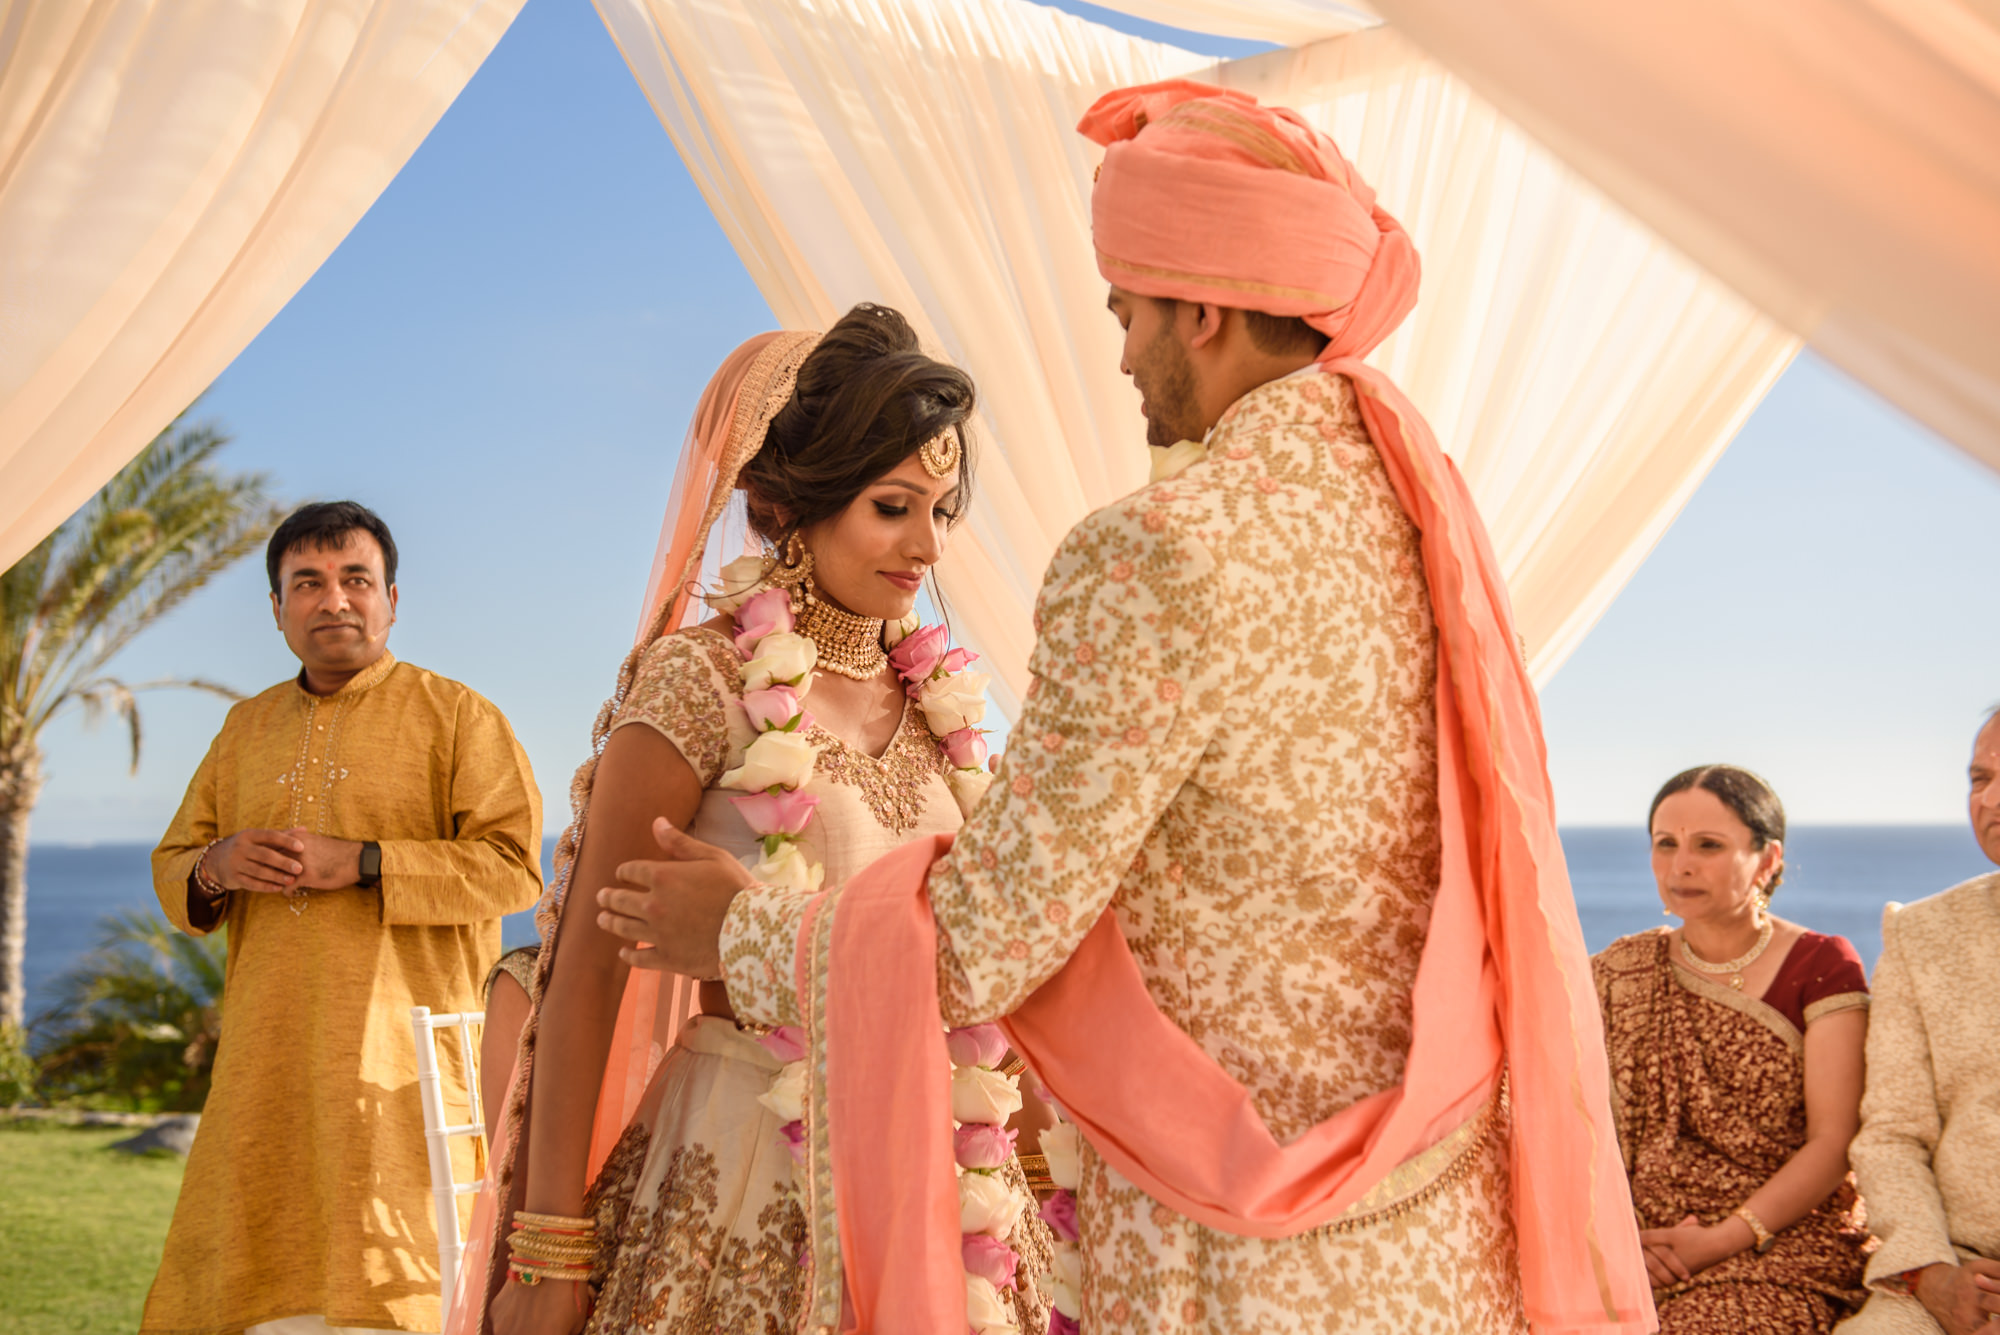 satnam photography wedding indian asian hindu destination wedding photographer tenerife ritz carlton abama-148.jpg